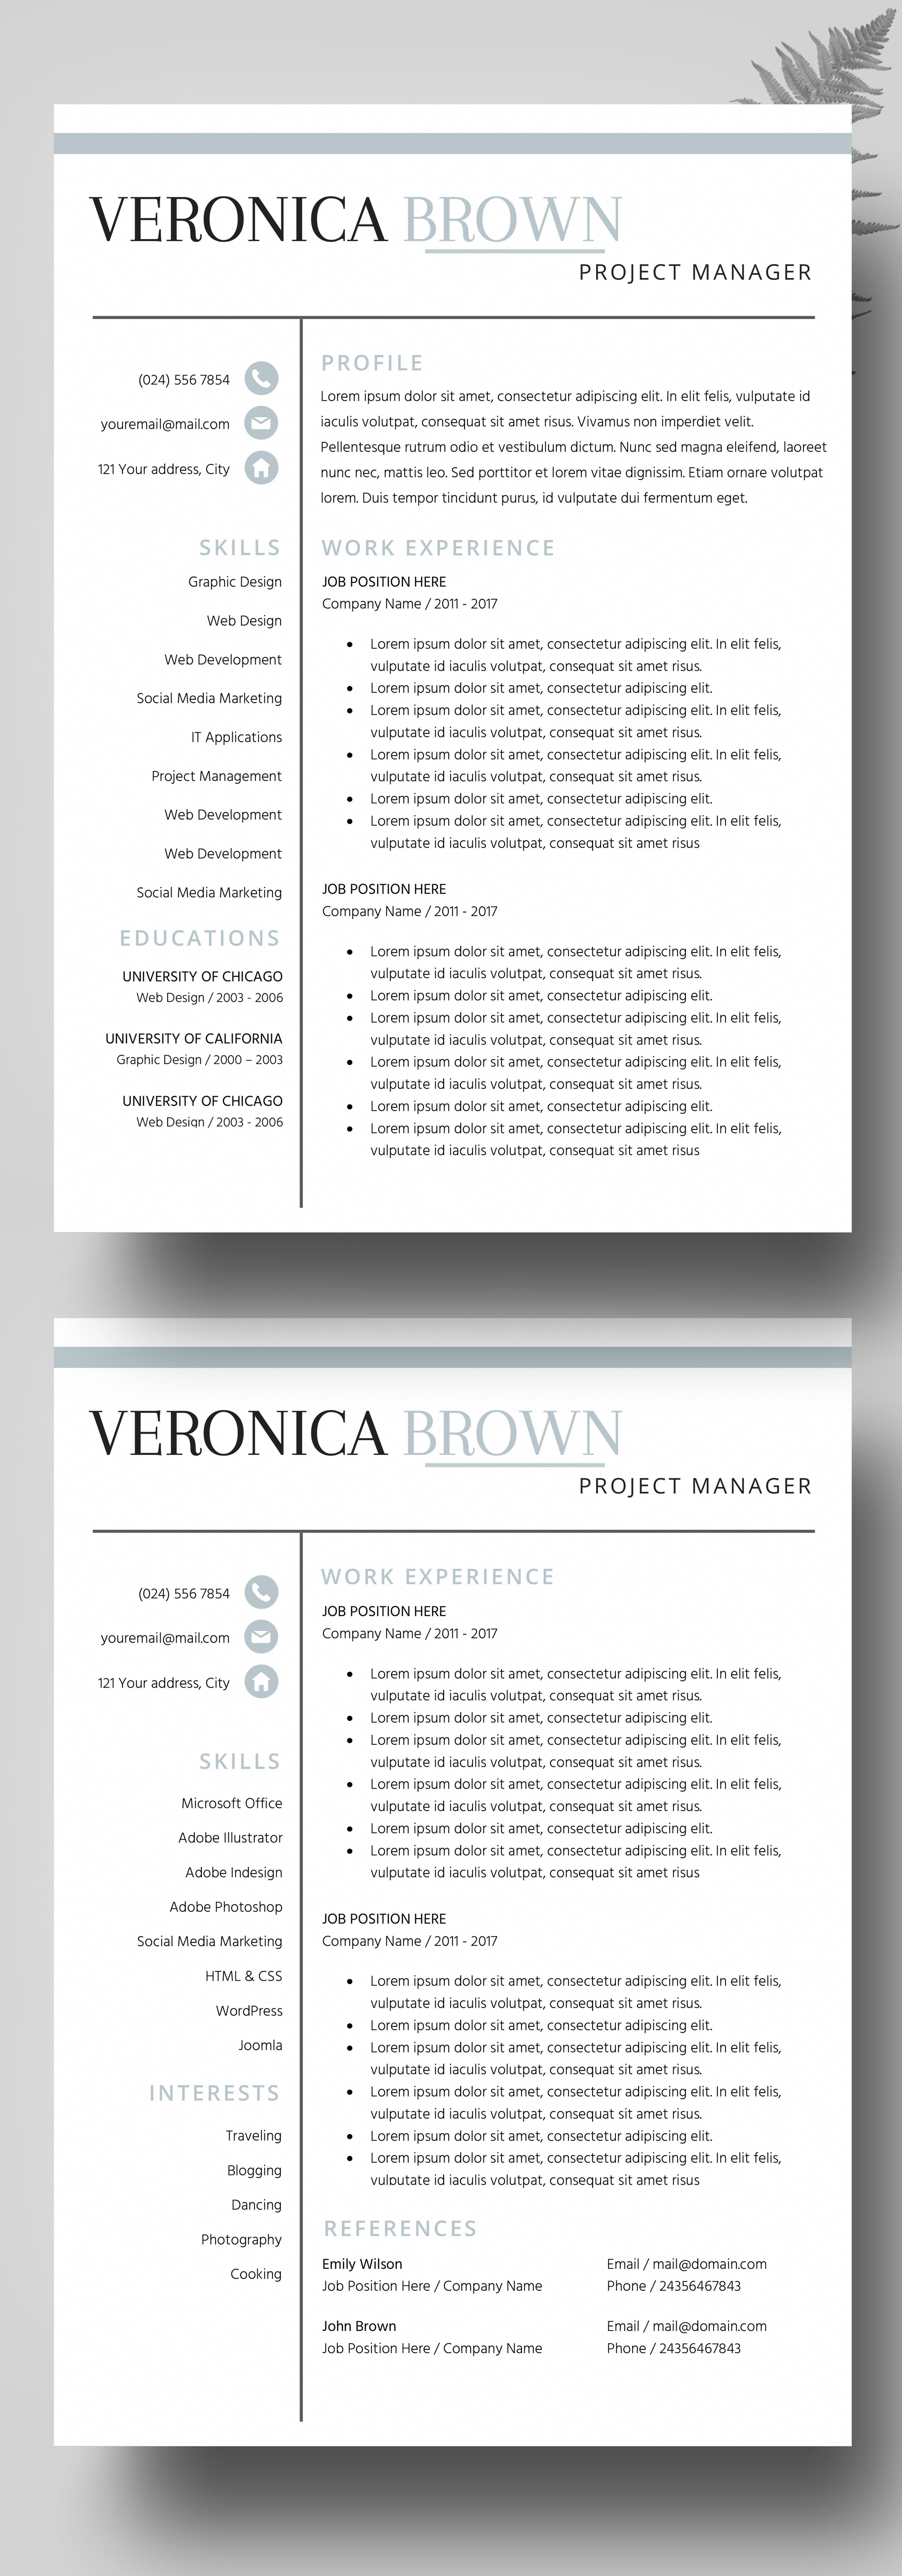 Resume Instant Download, Resume Templates Creative Resume